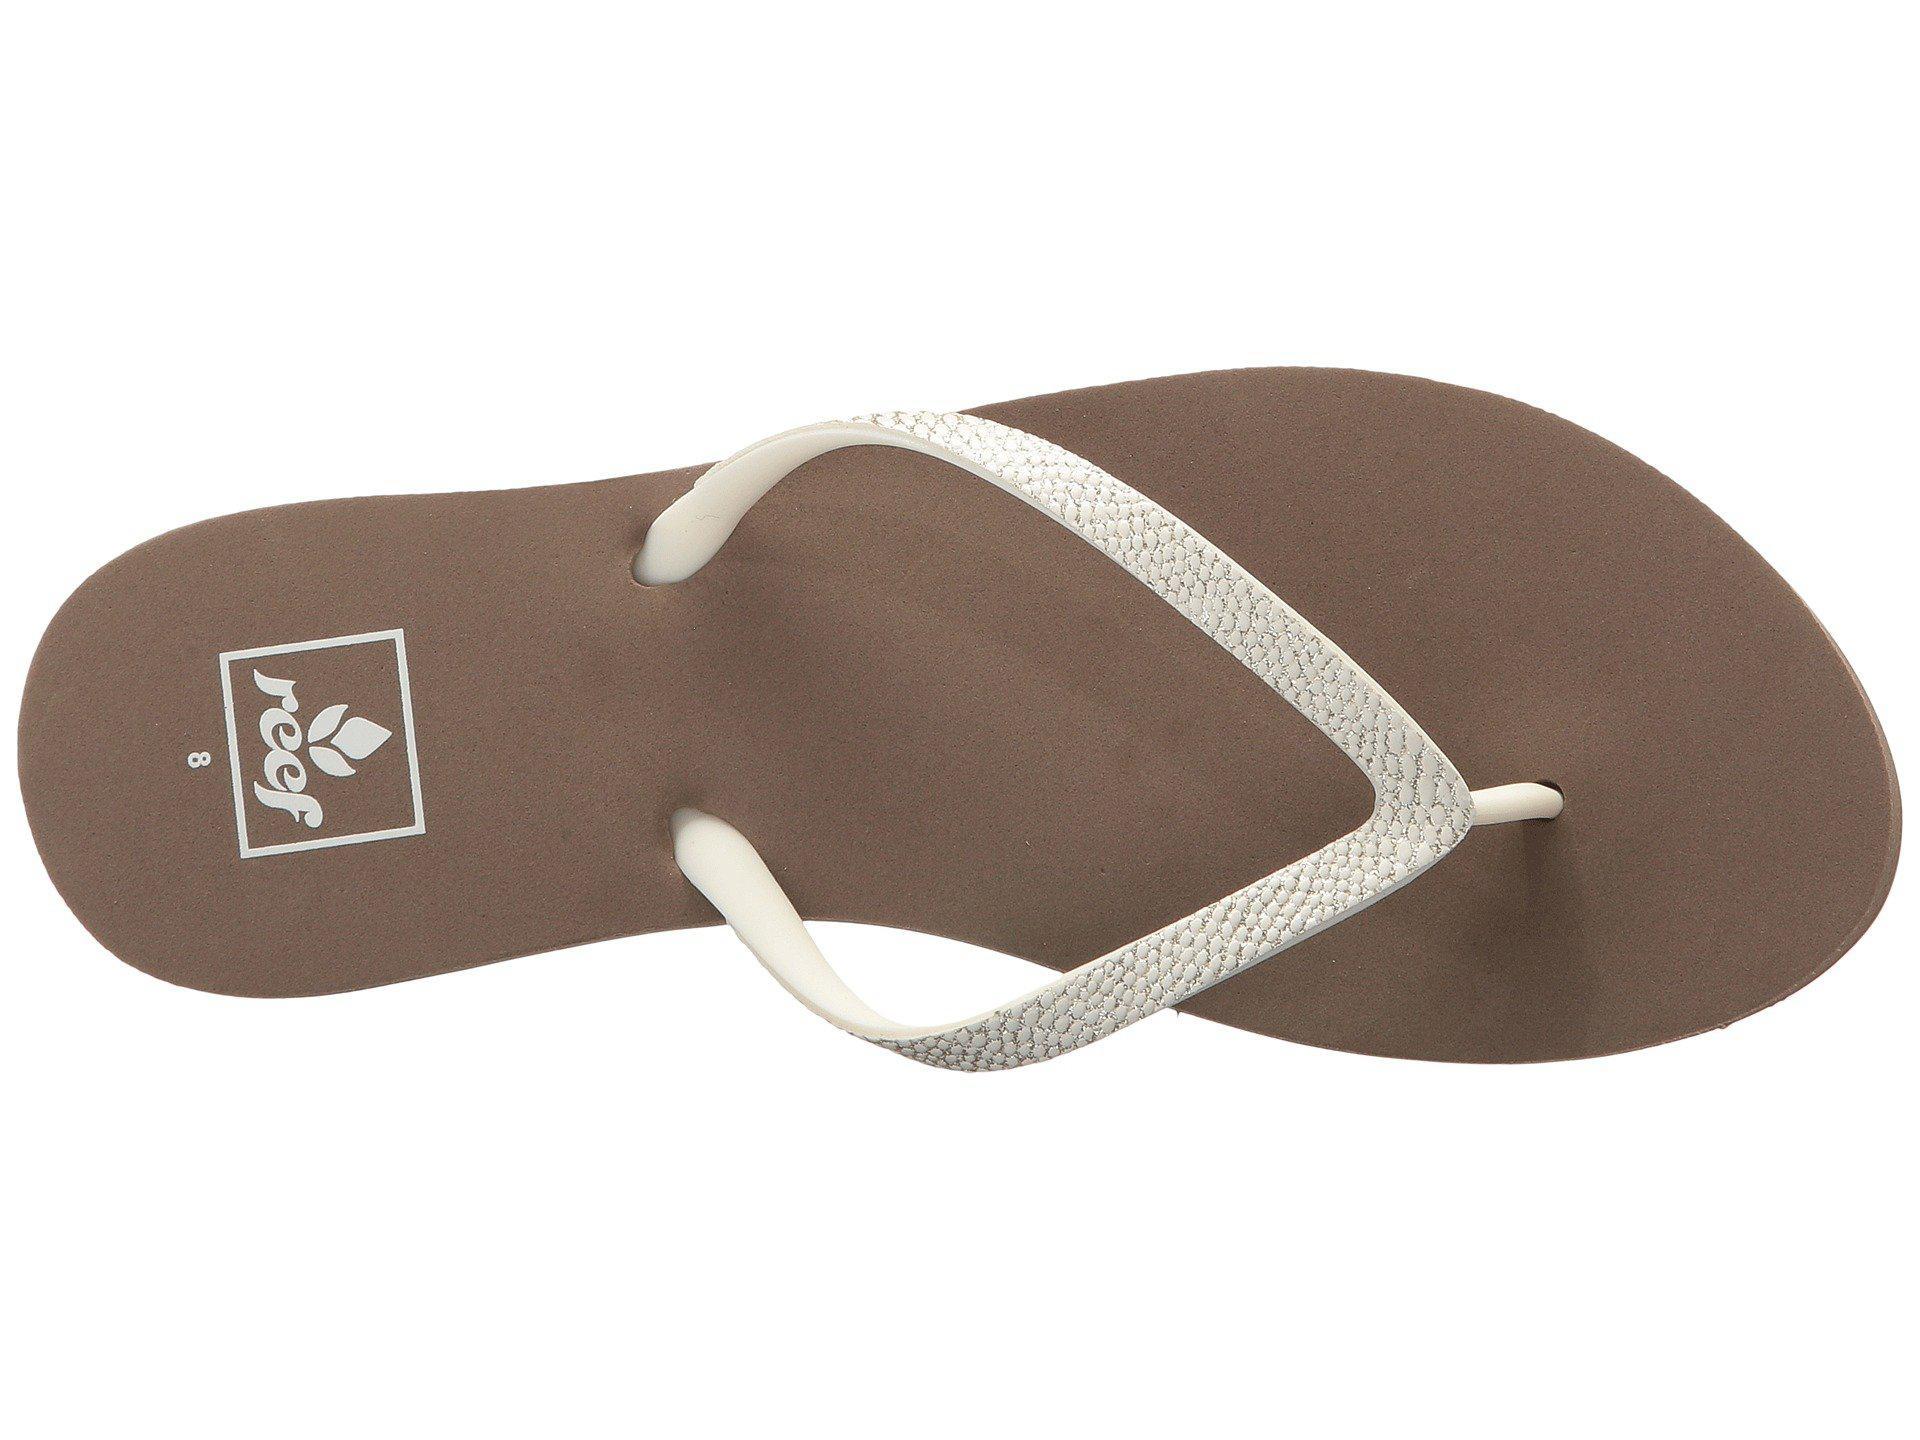 9a107b0c2 Reef - Gray Stargazer Sassy (blush) Women s Sandals - Lyst. View fullscreen